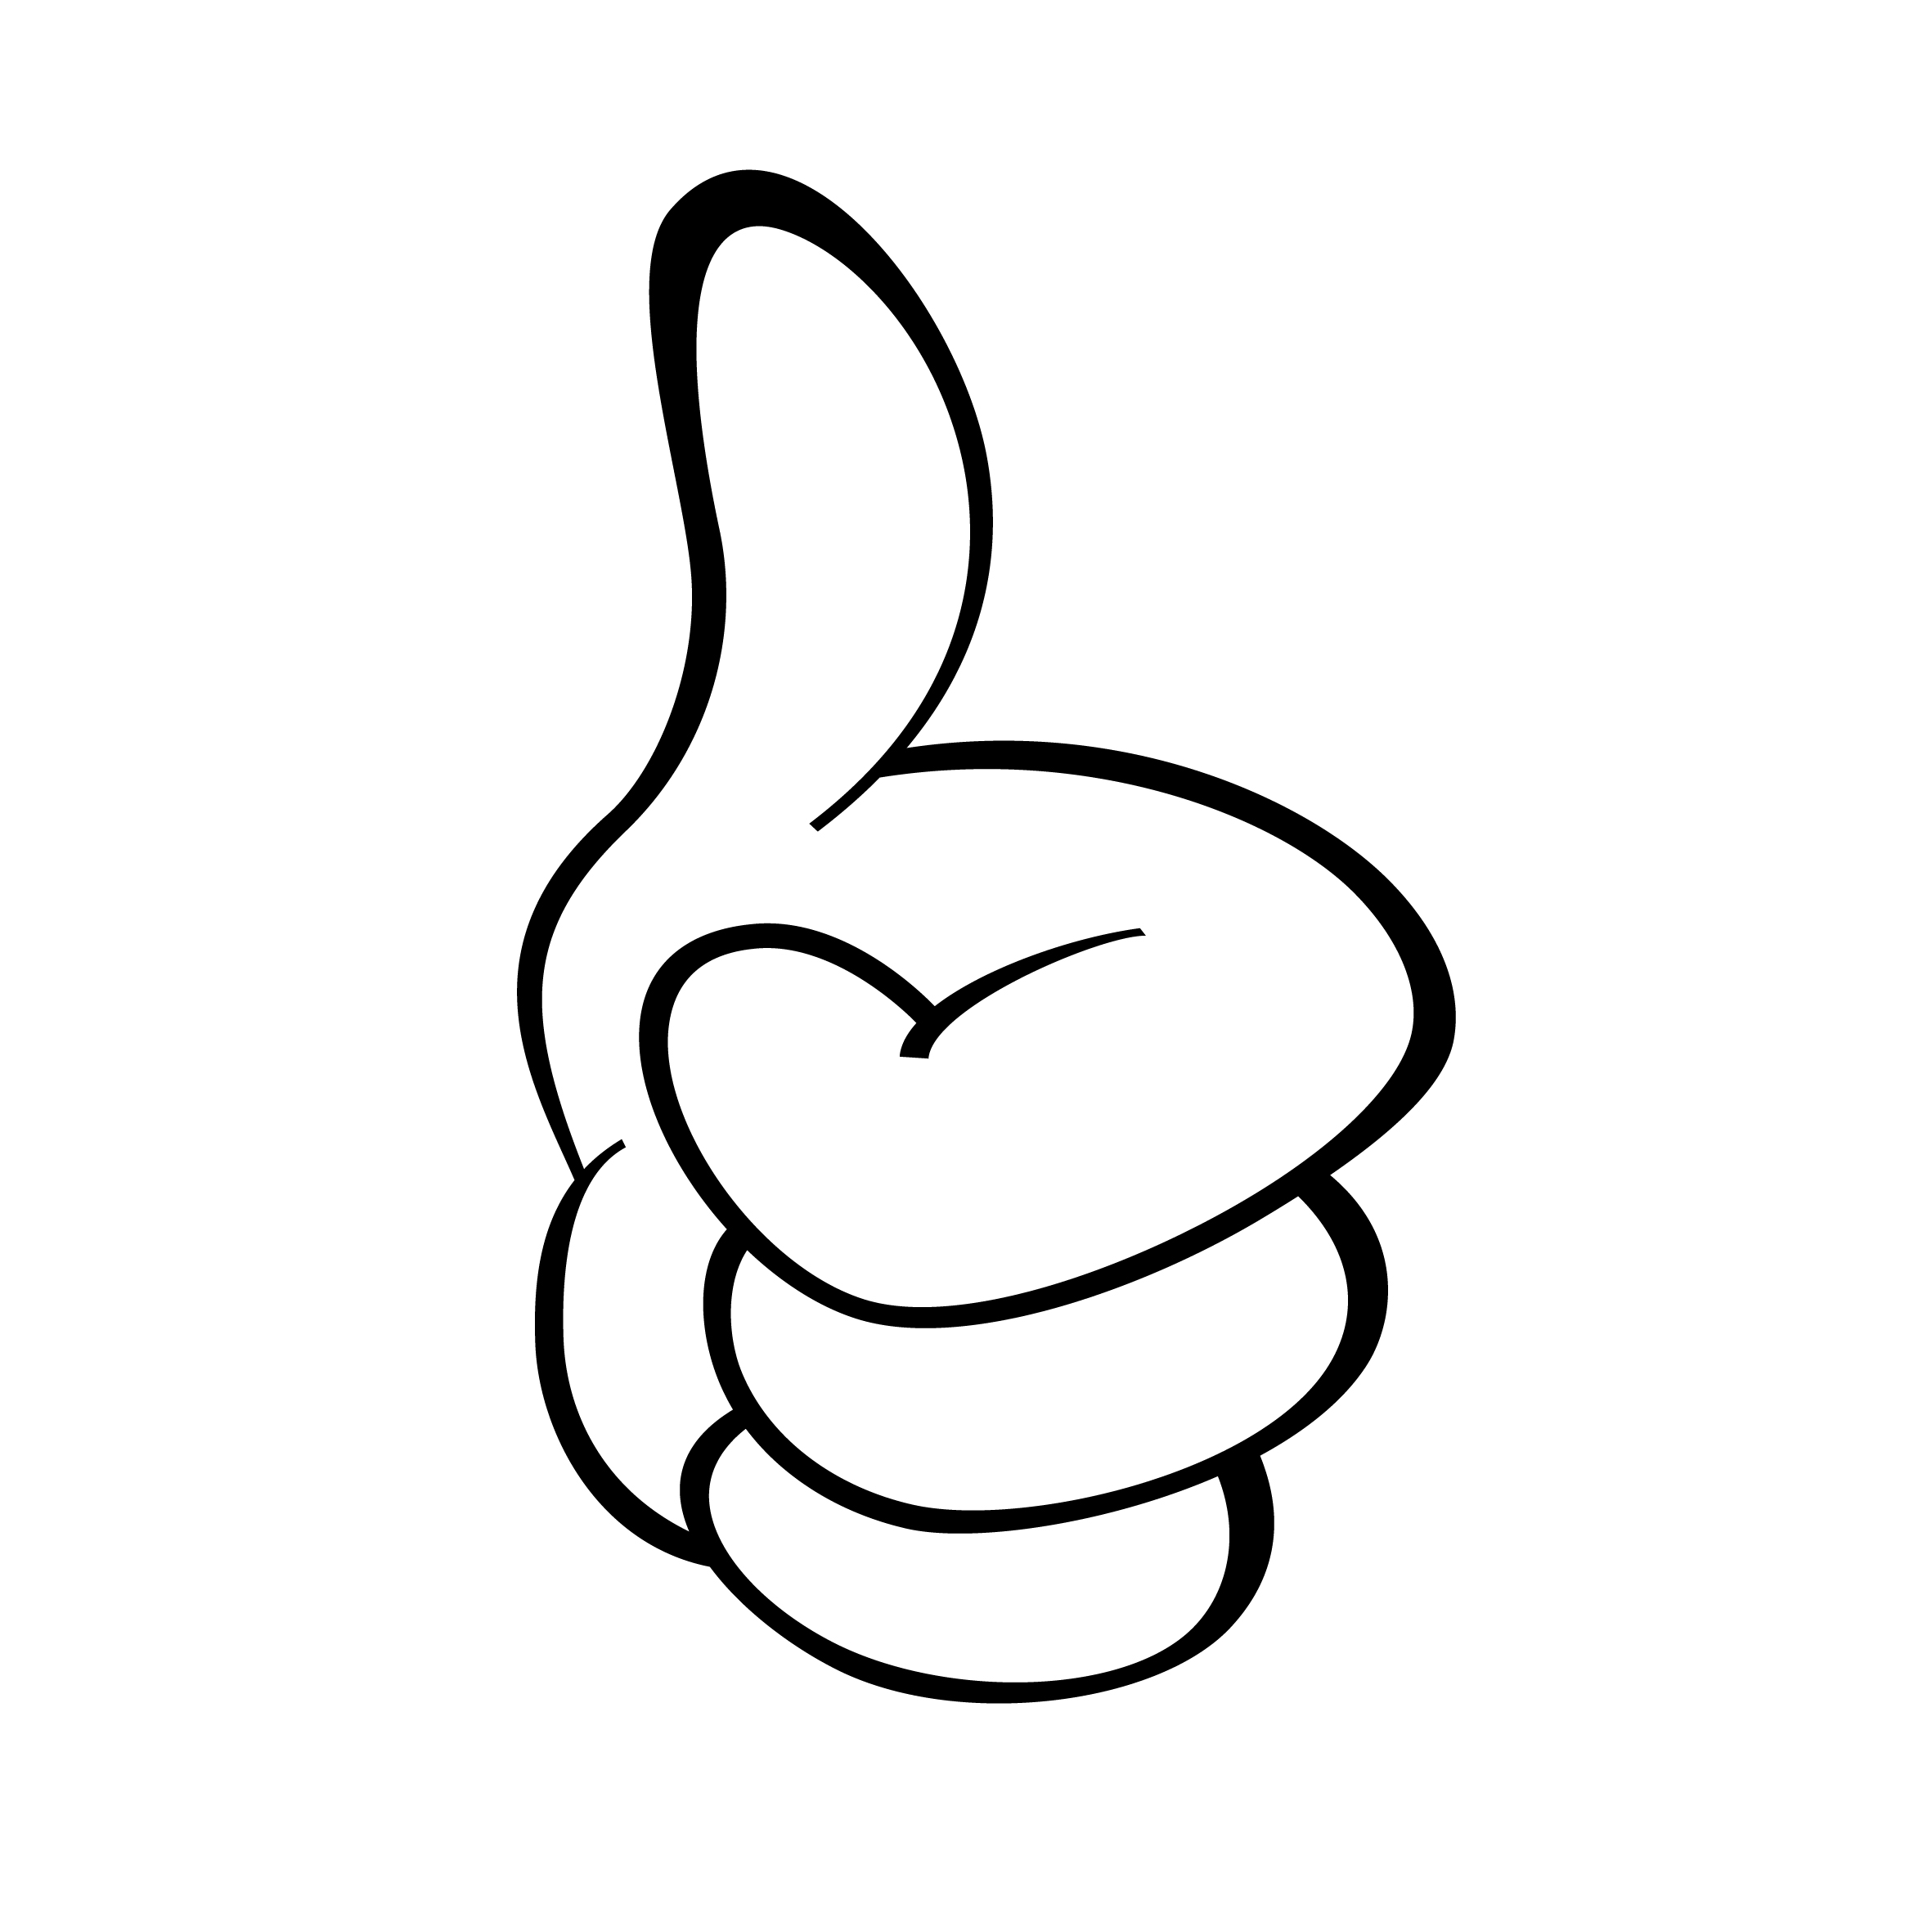 Thumbs Up Smily Clipart-Thumbs up smily clipart-14